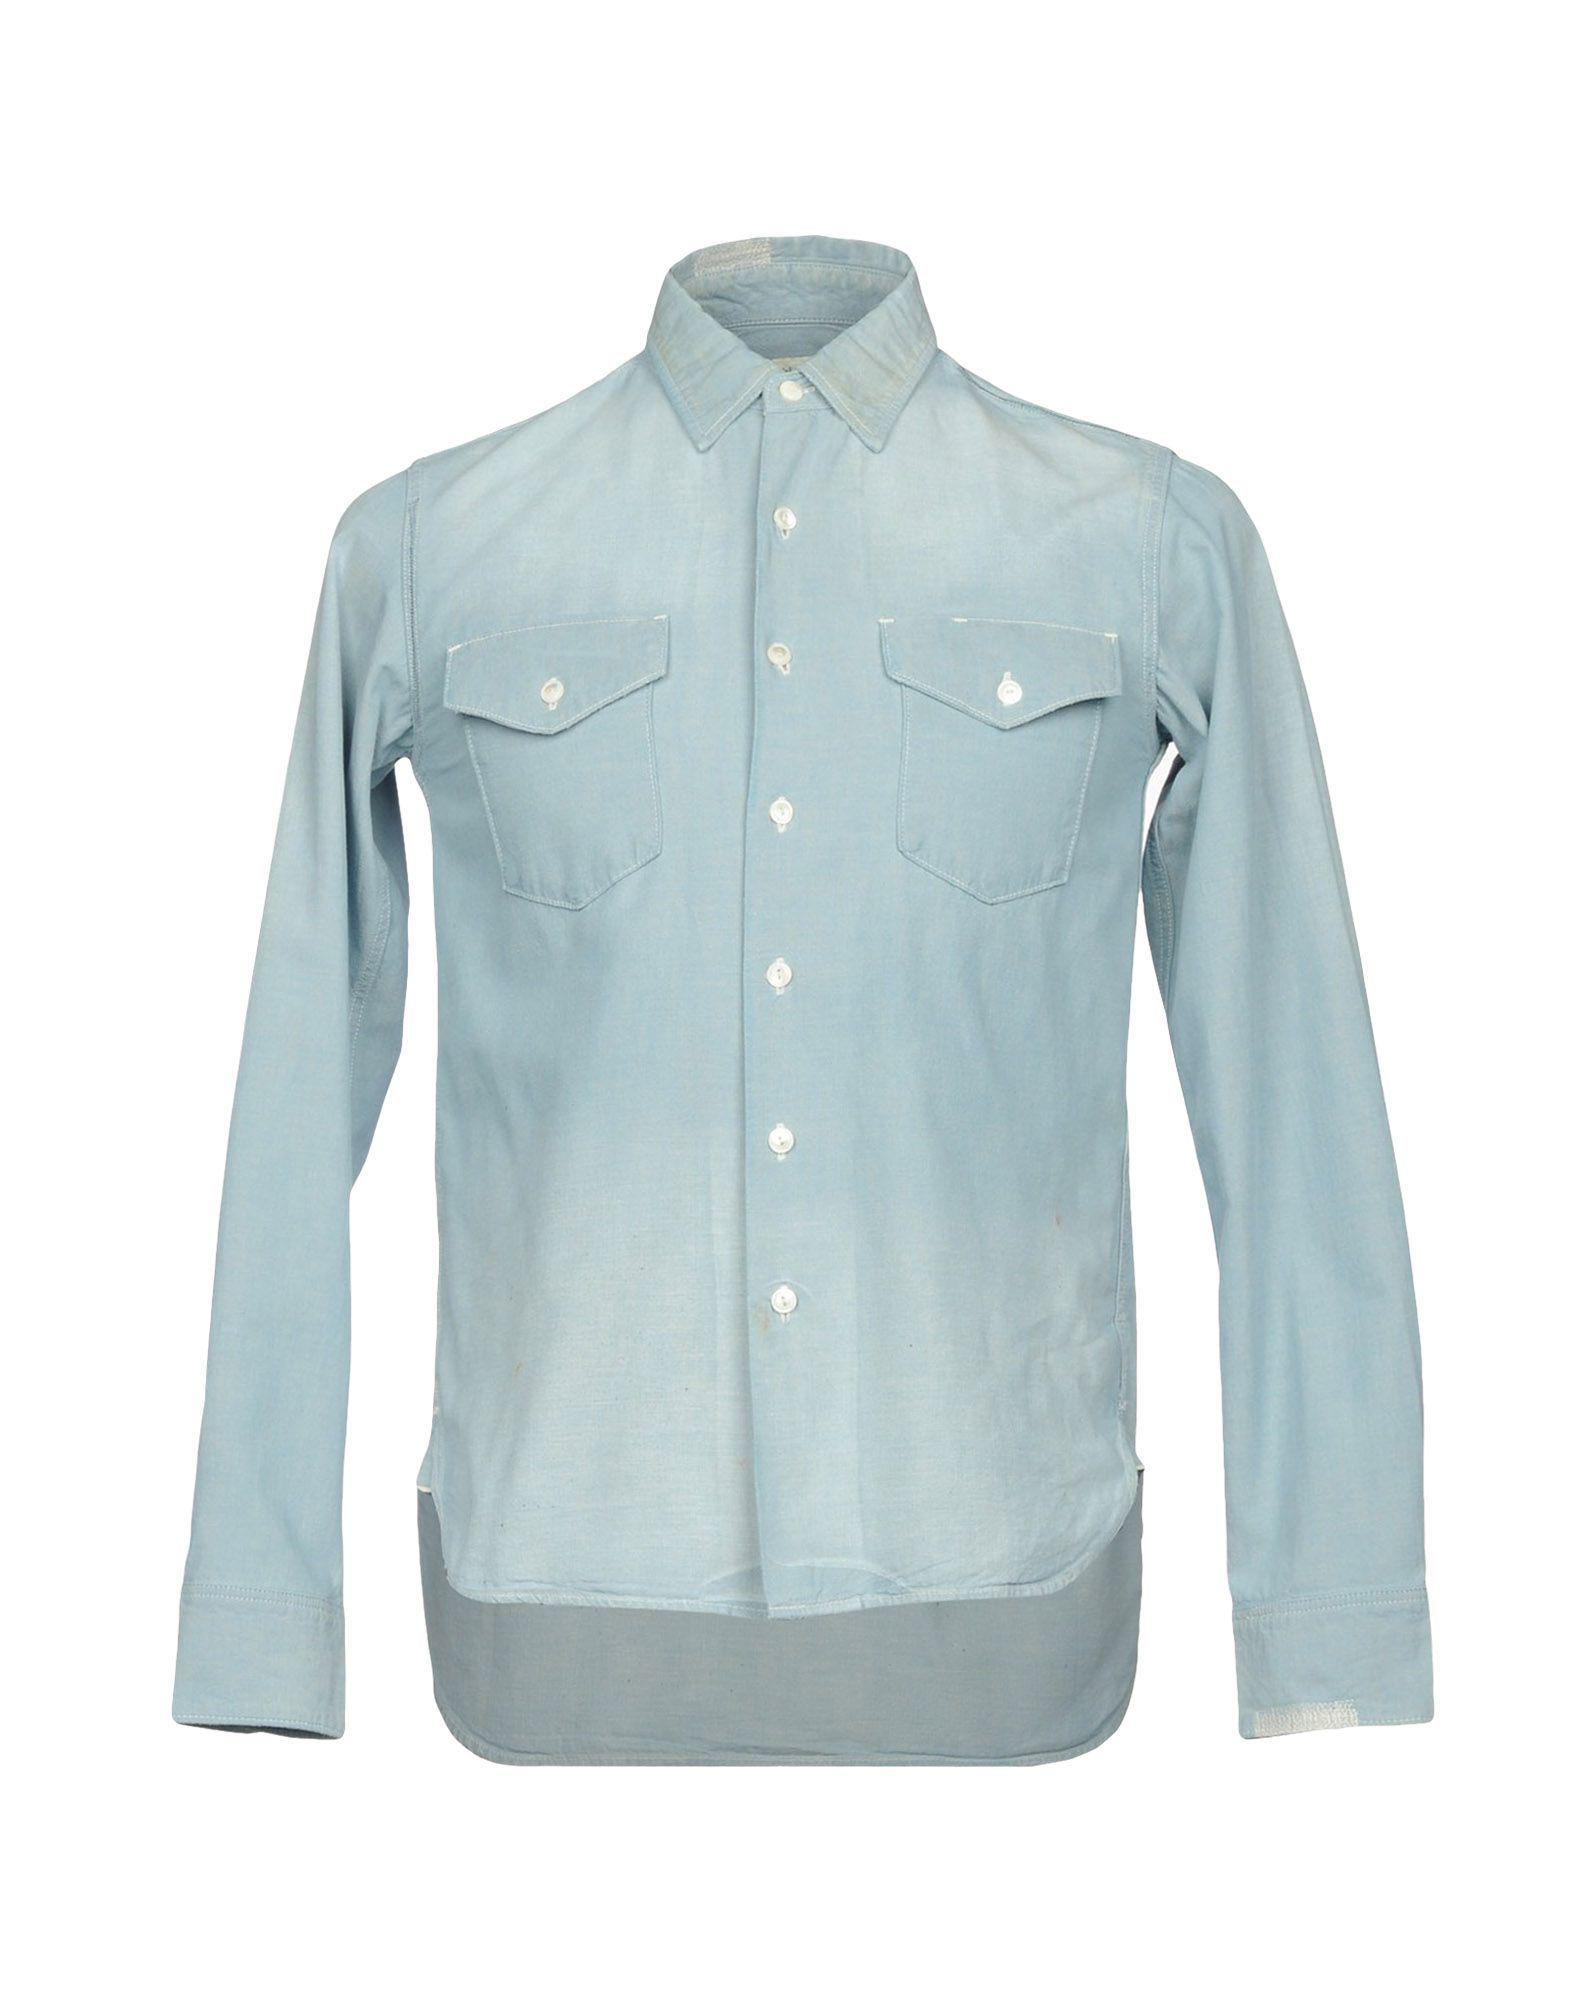 80a2f4c7b4 Denim Shirts · CHIMALA .  chimala  cloth